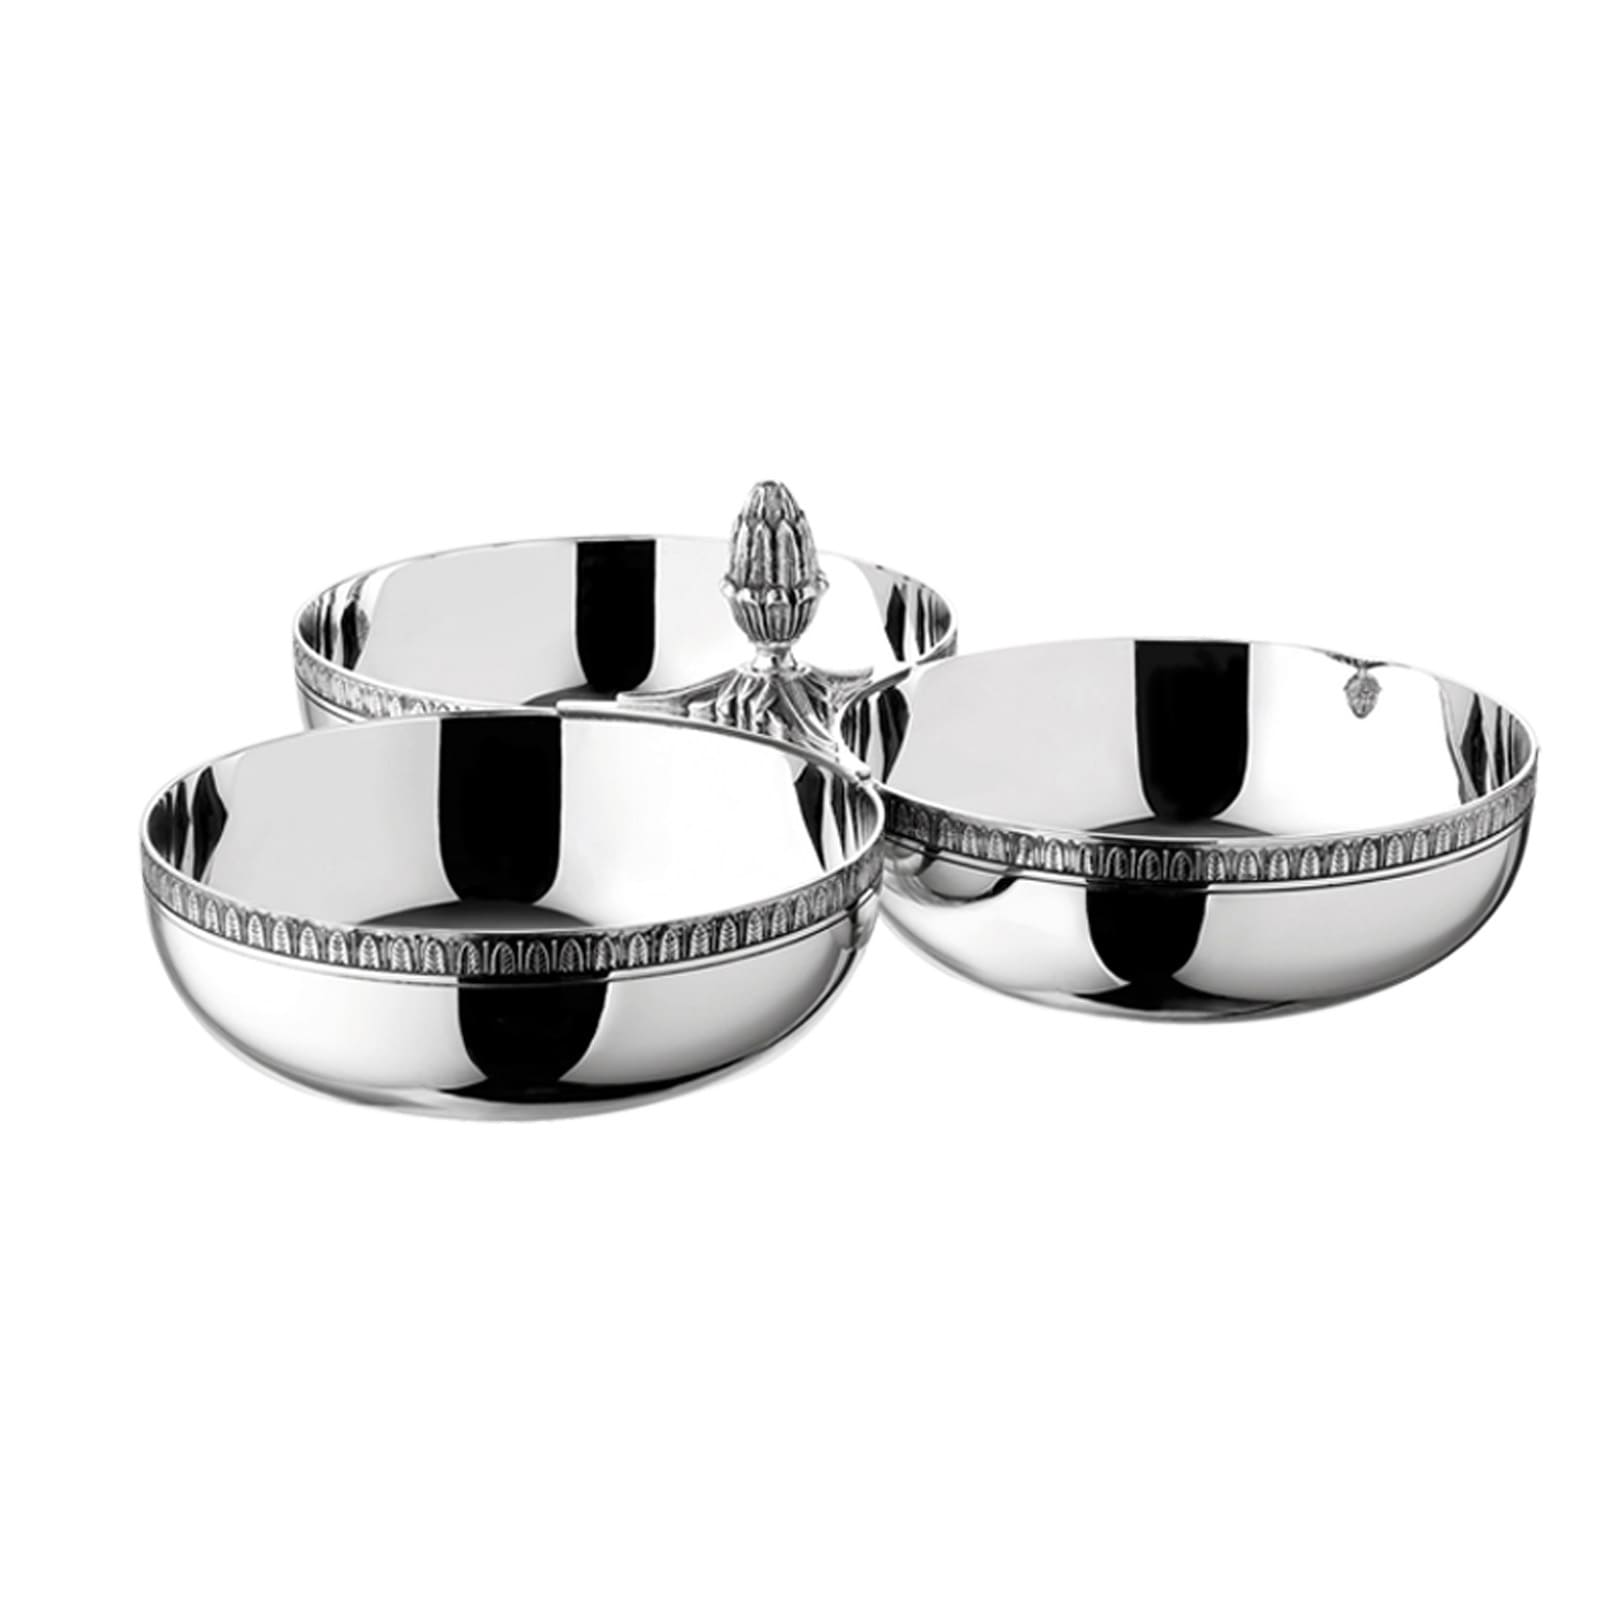 christofle silver plated malmaison centerpiece